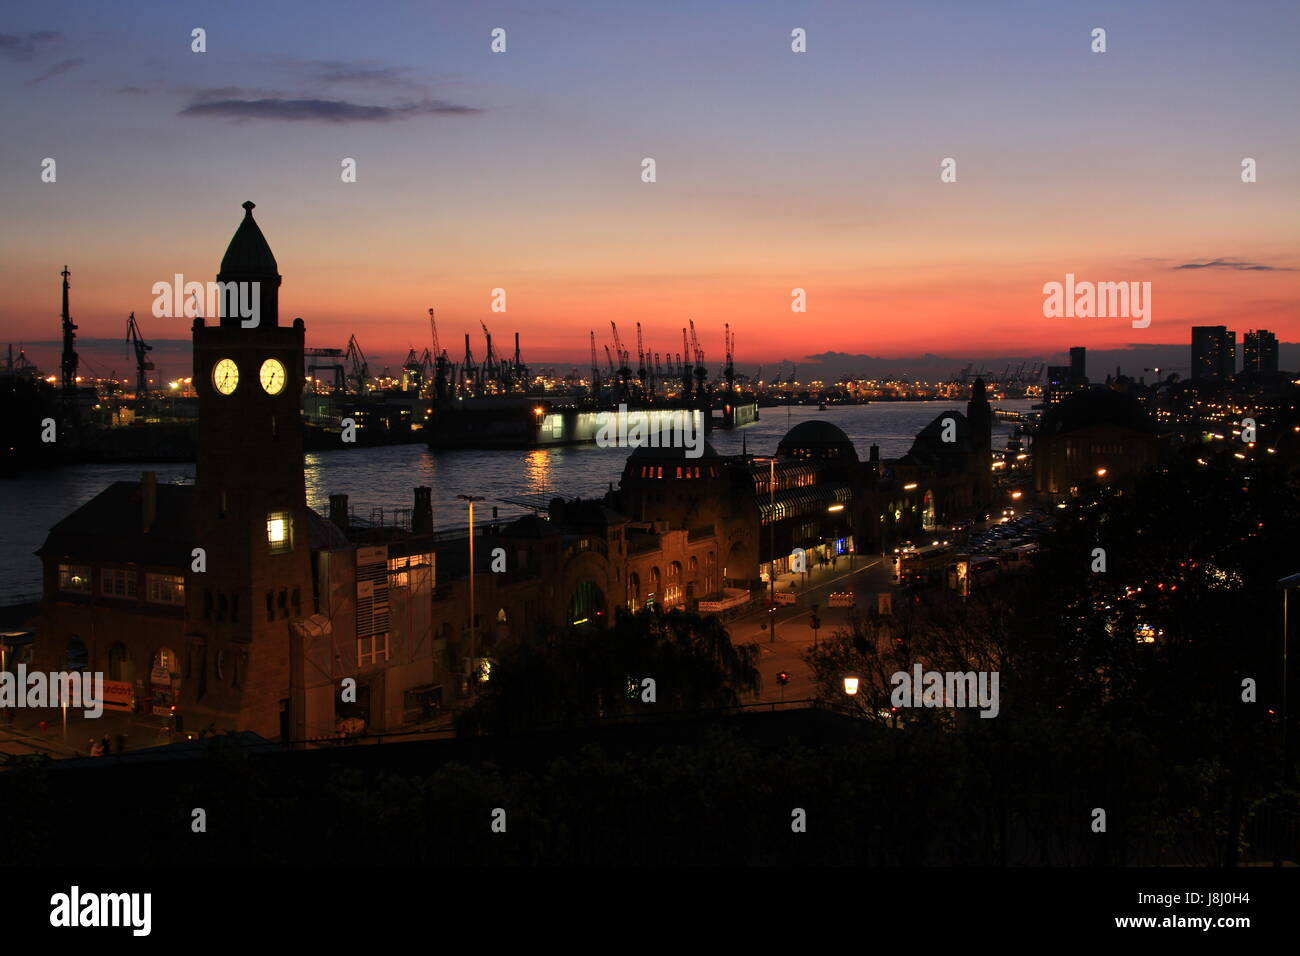 harbor, hamburg, gangplanks, harbours, memory city, tower, church, city, town, - Stock Image